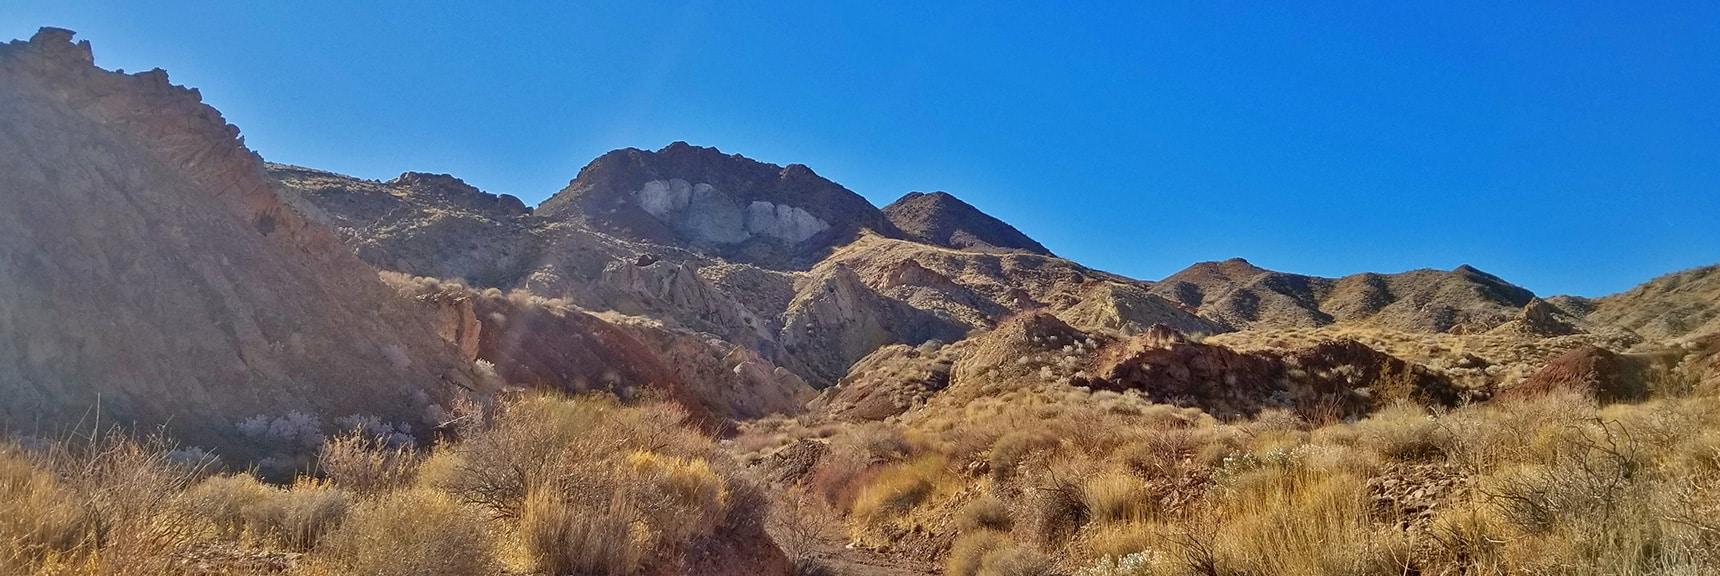 High Points From the Canyon Washes Toward Hamblin Mt. | Hamblin Mountain, Lake Mead National Conservation Area, Nevada